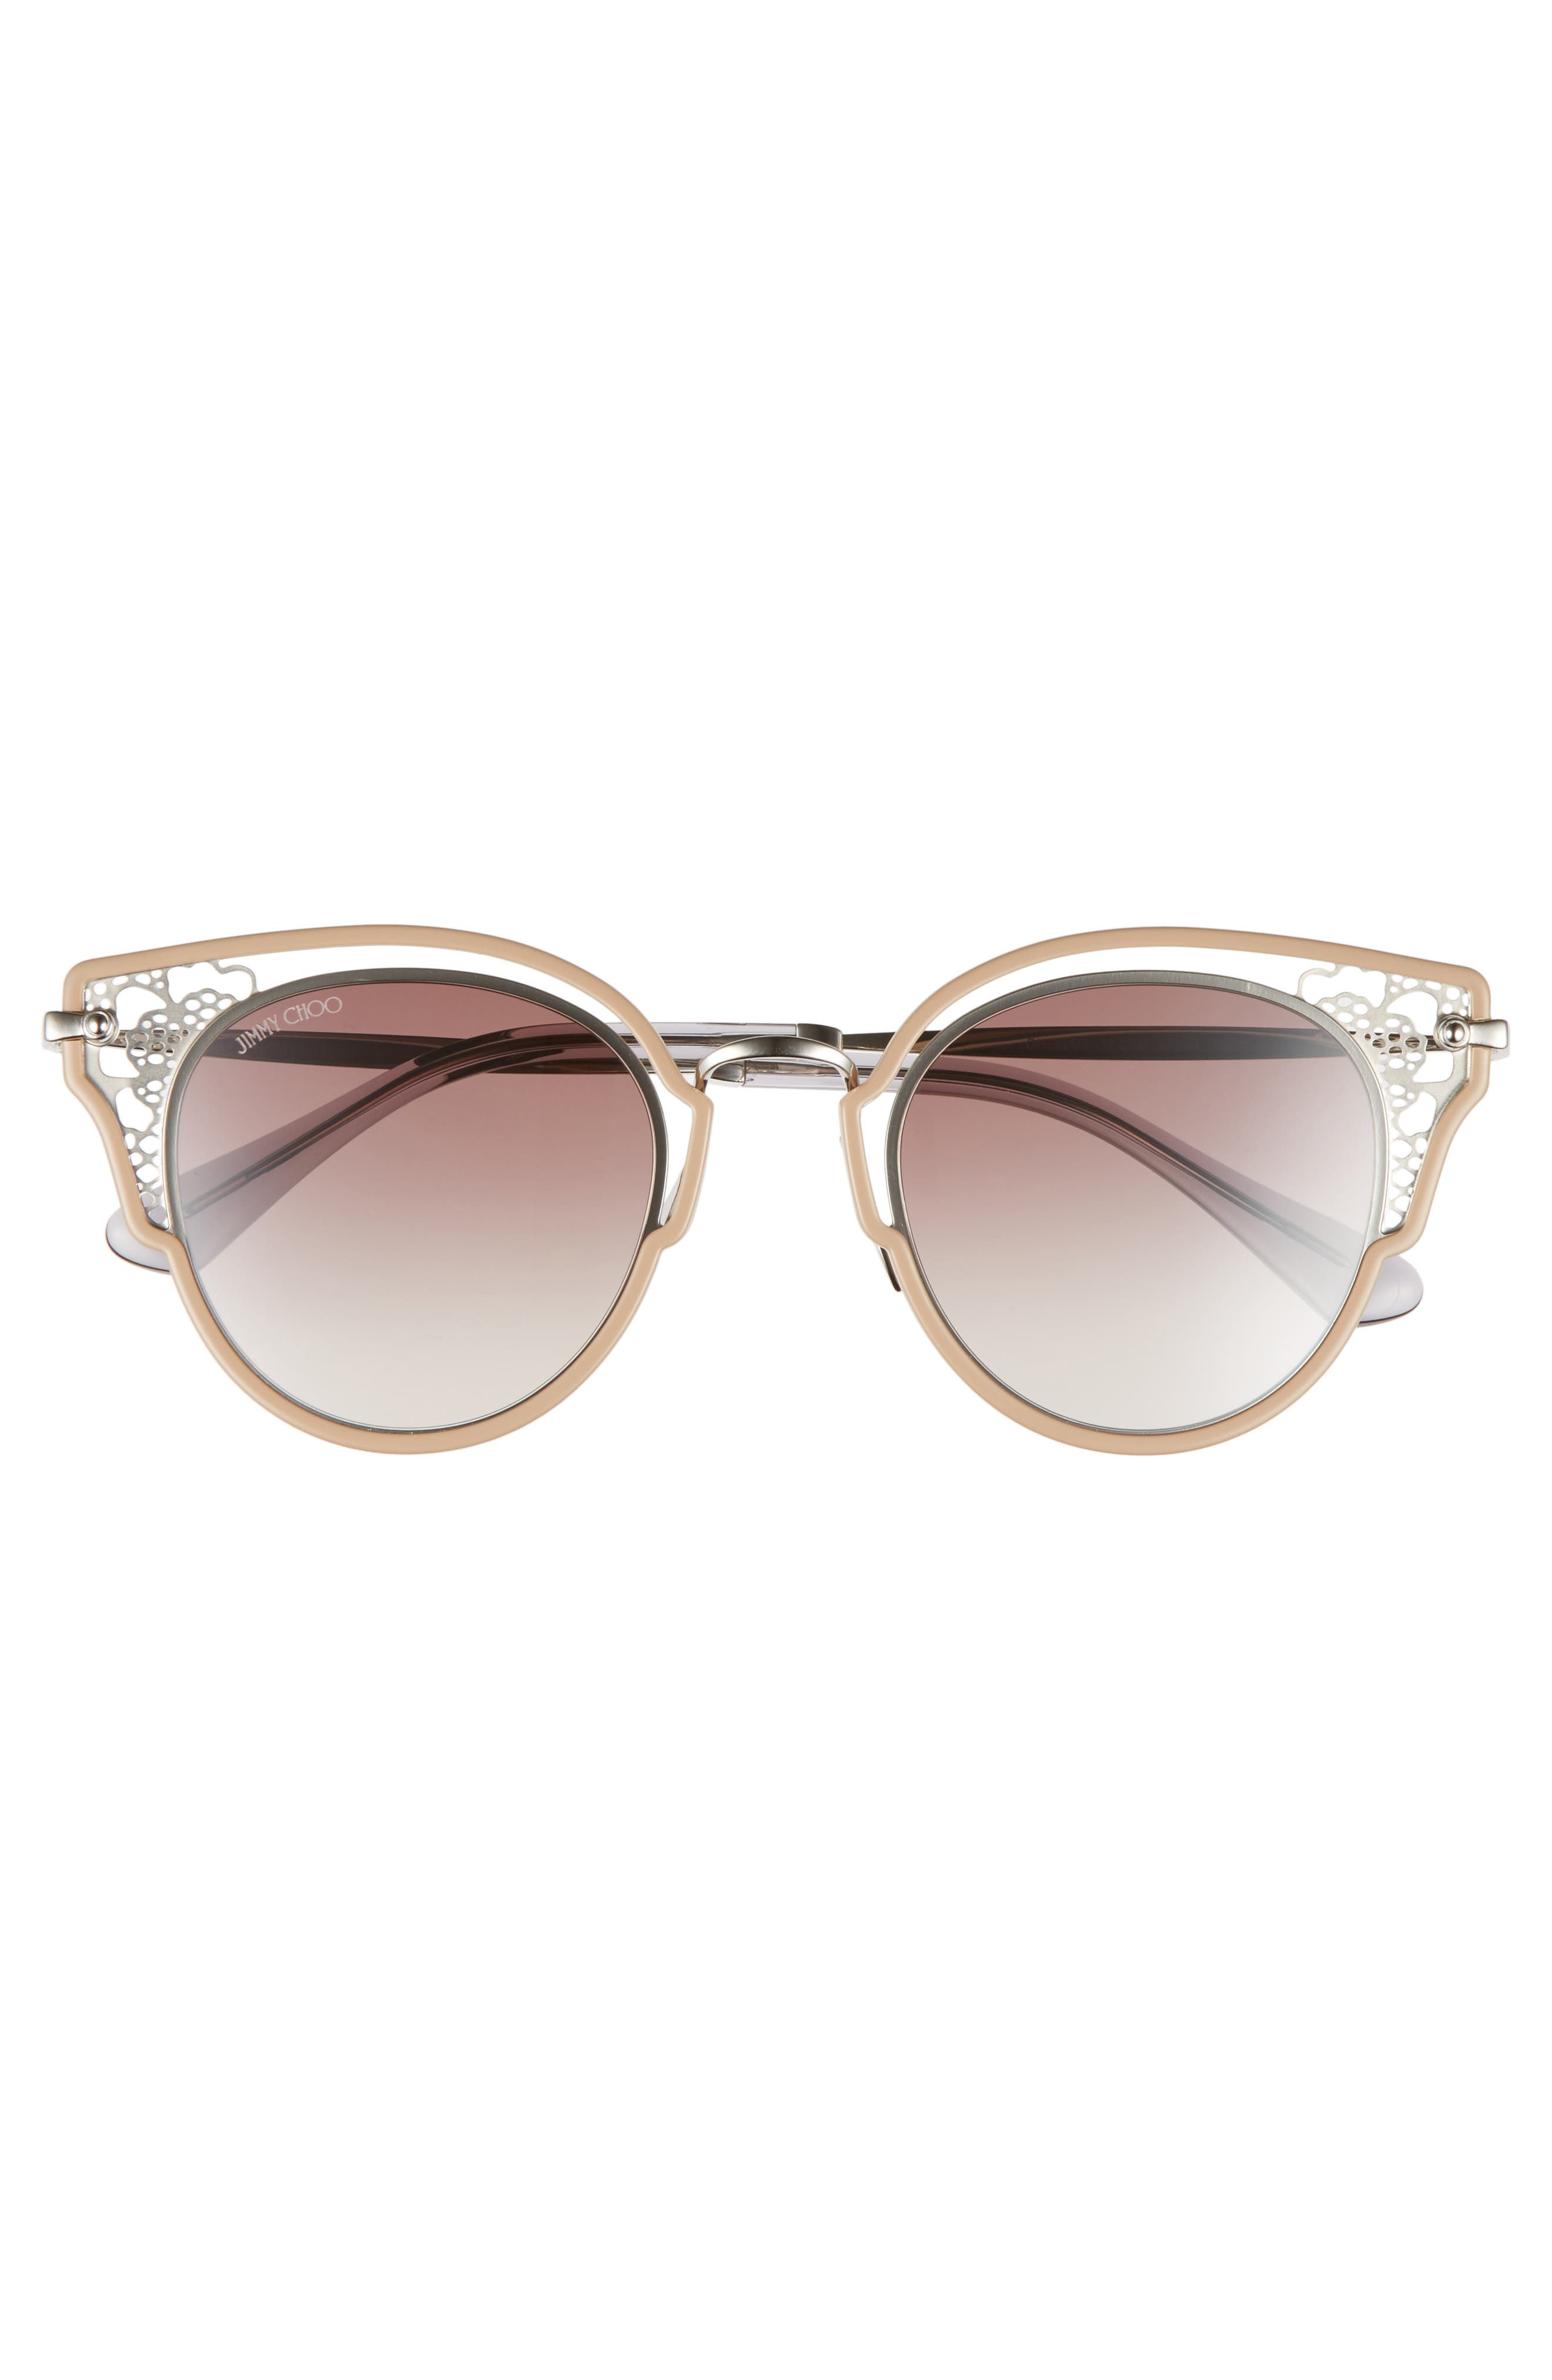 Dhelias 48mm Cat Eye Sunglasses,                             Alternate thumbnail 3, color,                             NUDE PALLADIUM